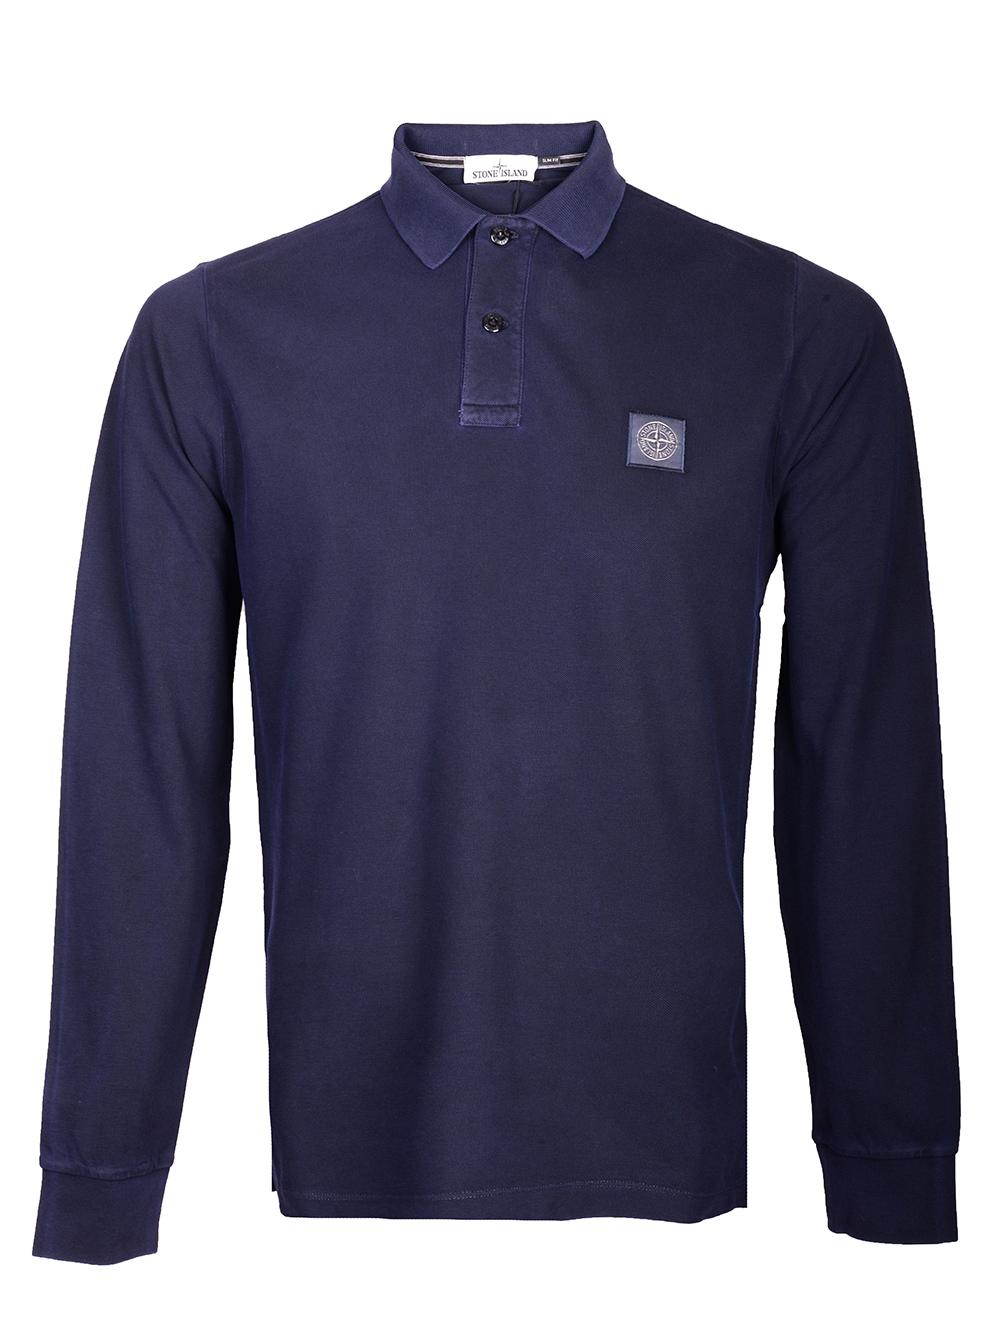 STONE ISLAND Μπλούζα Polo 71152SS67 ΜΠΛΕ